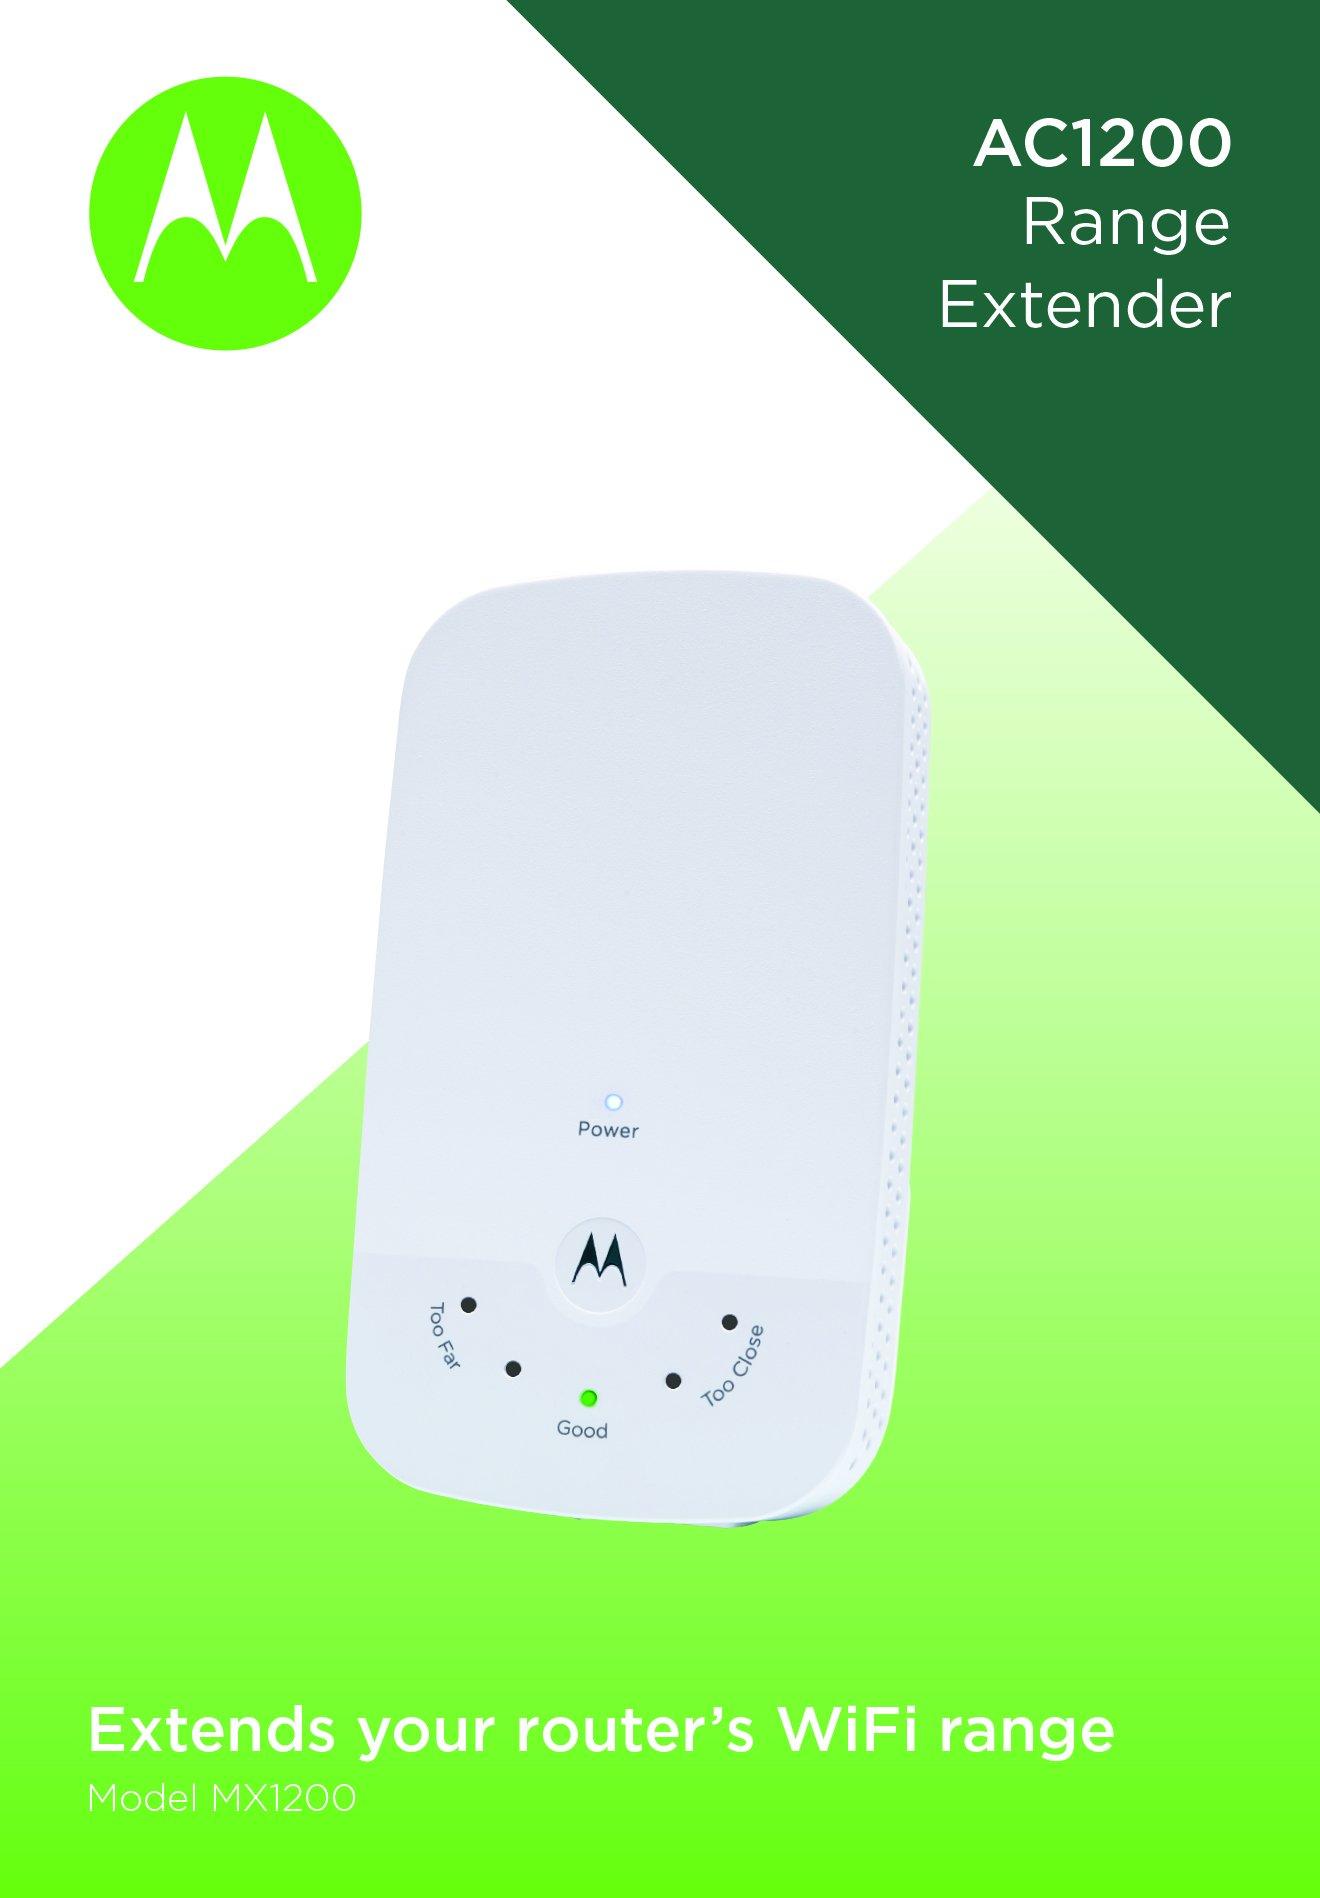 MOTOROLA AC1200 WiFi Range Extender with Gigabit Ethernet, Dual Band, Model MX1200 by Motorola (Image #4)